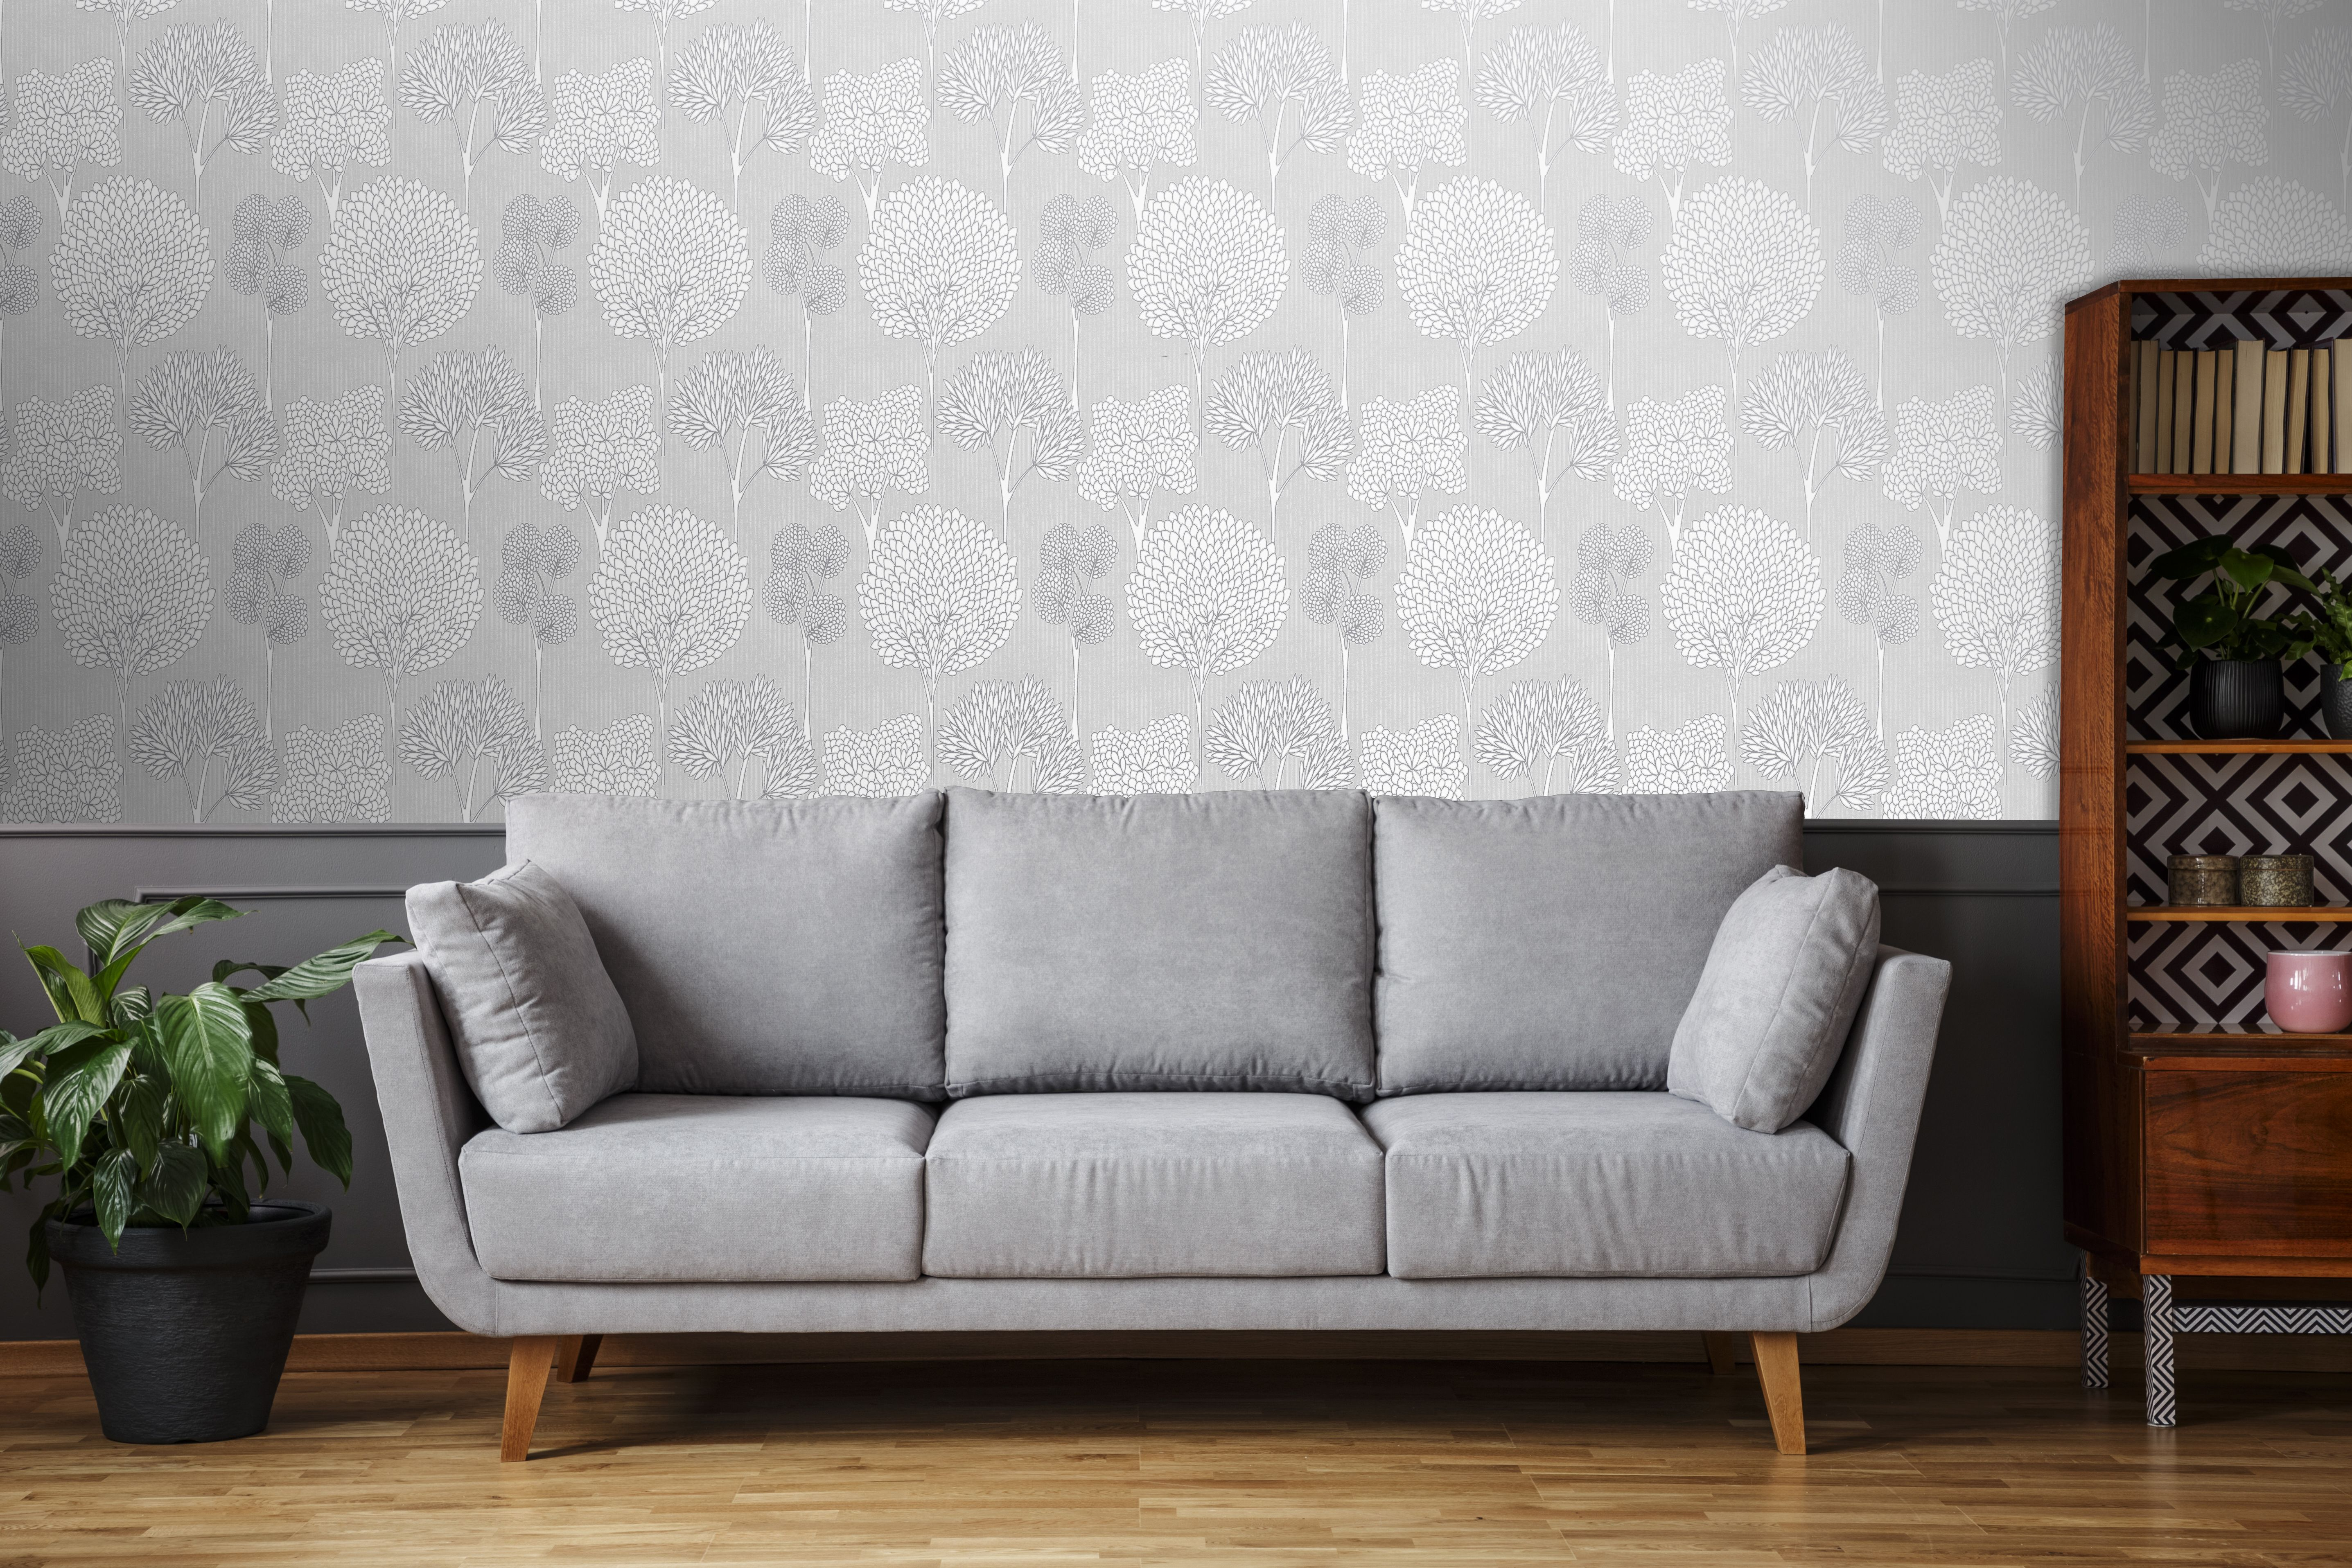 Whimsical Home Decor Subtle Textures Mid Century Modern